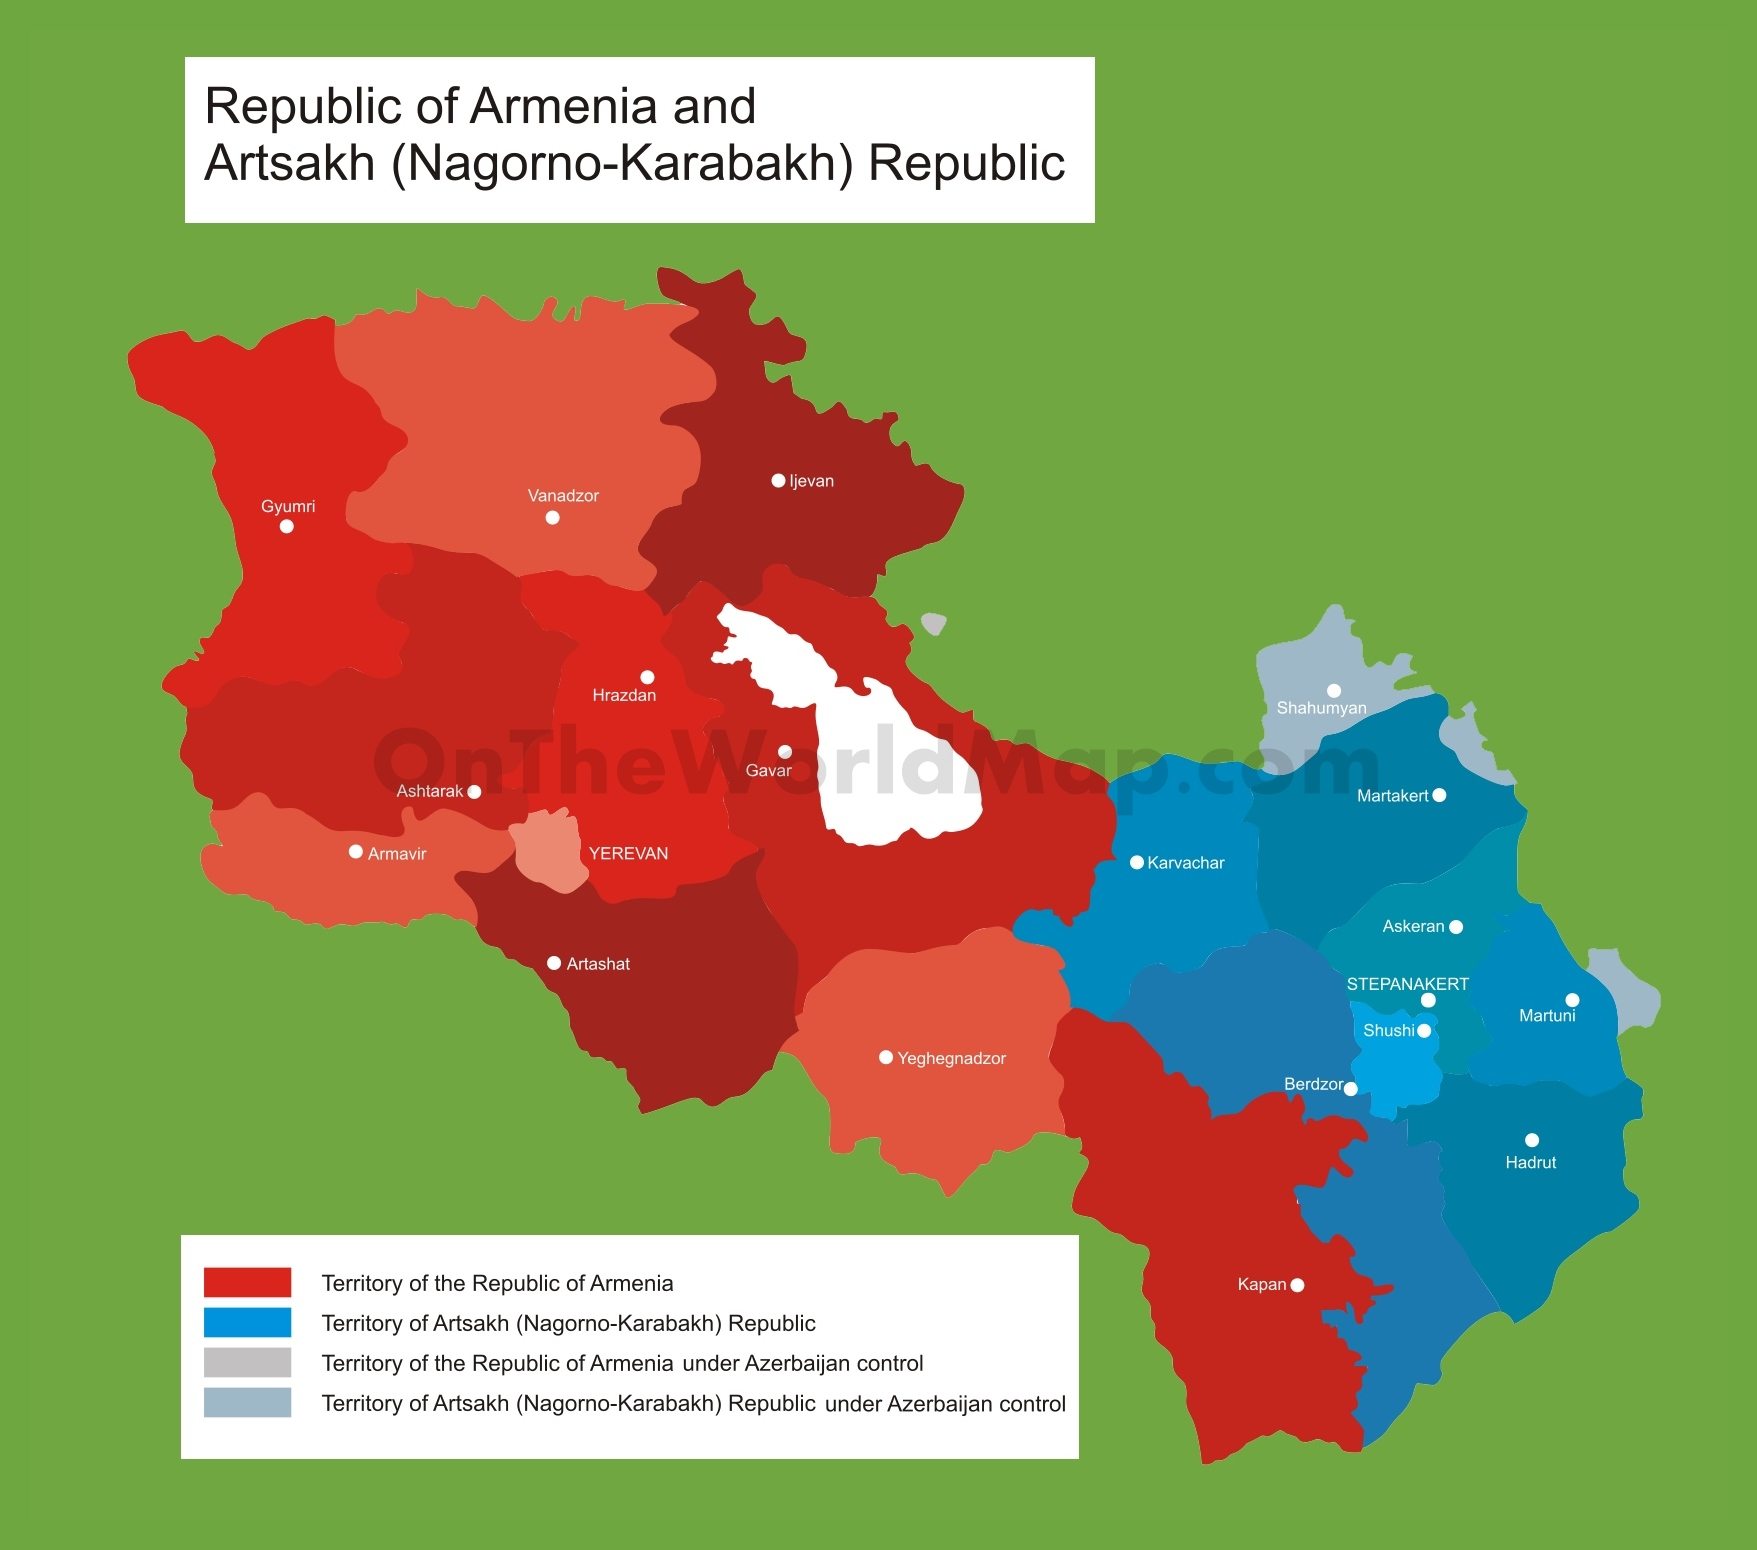 Map of Armenia and disputed territory of Nagorno Karabakh